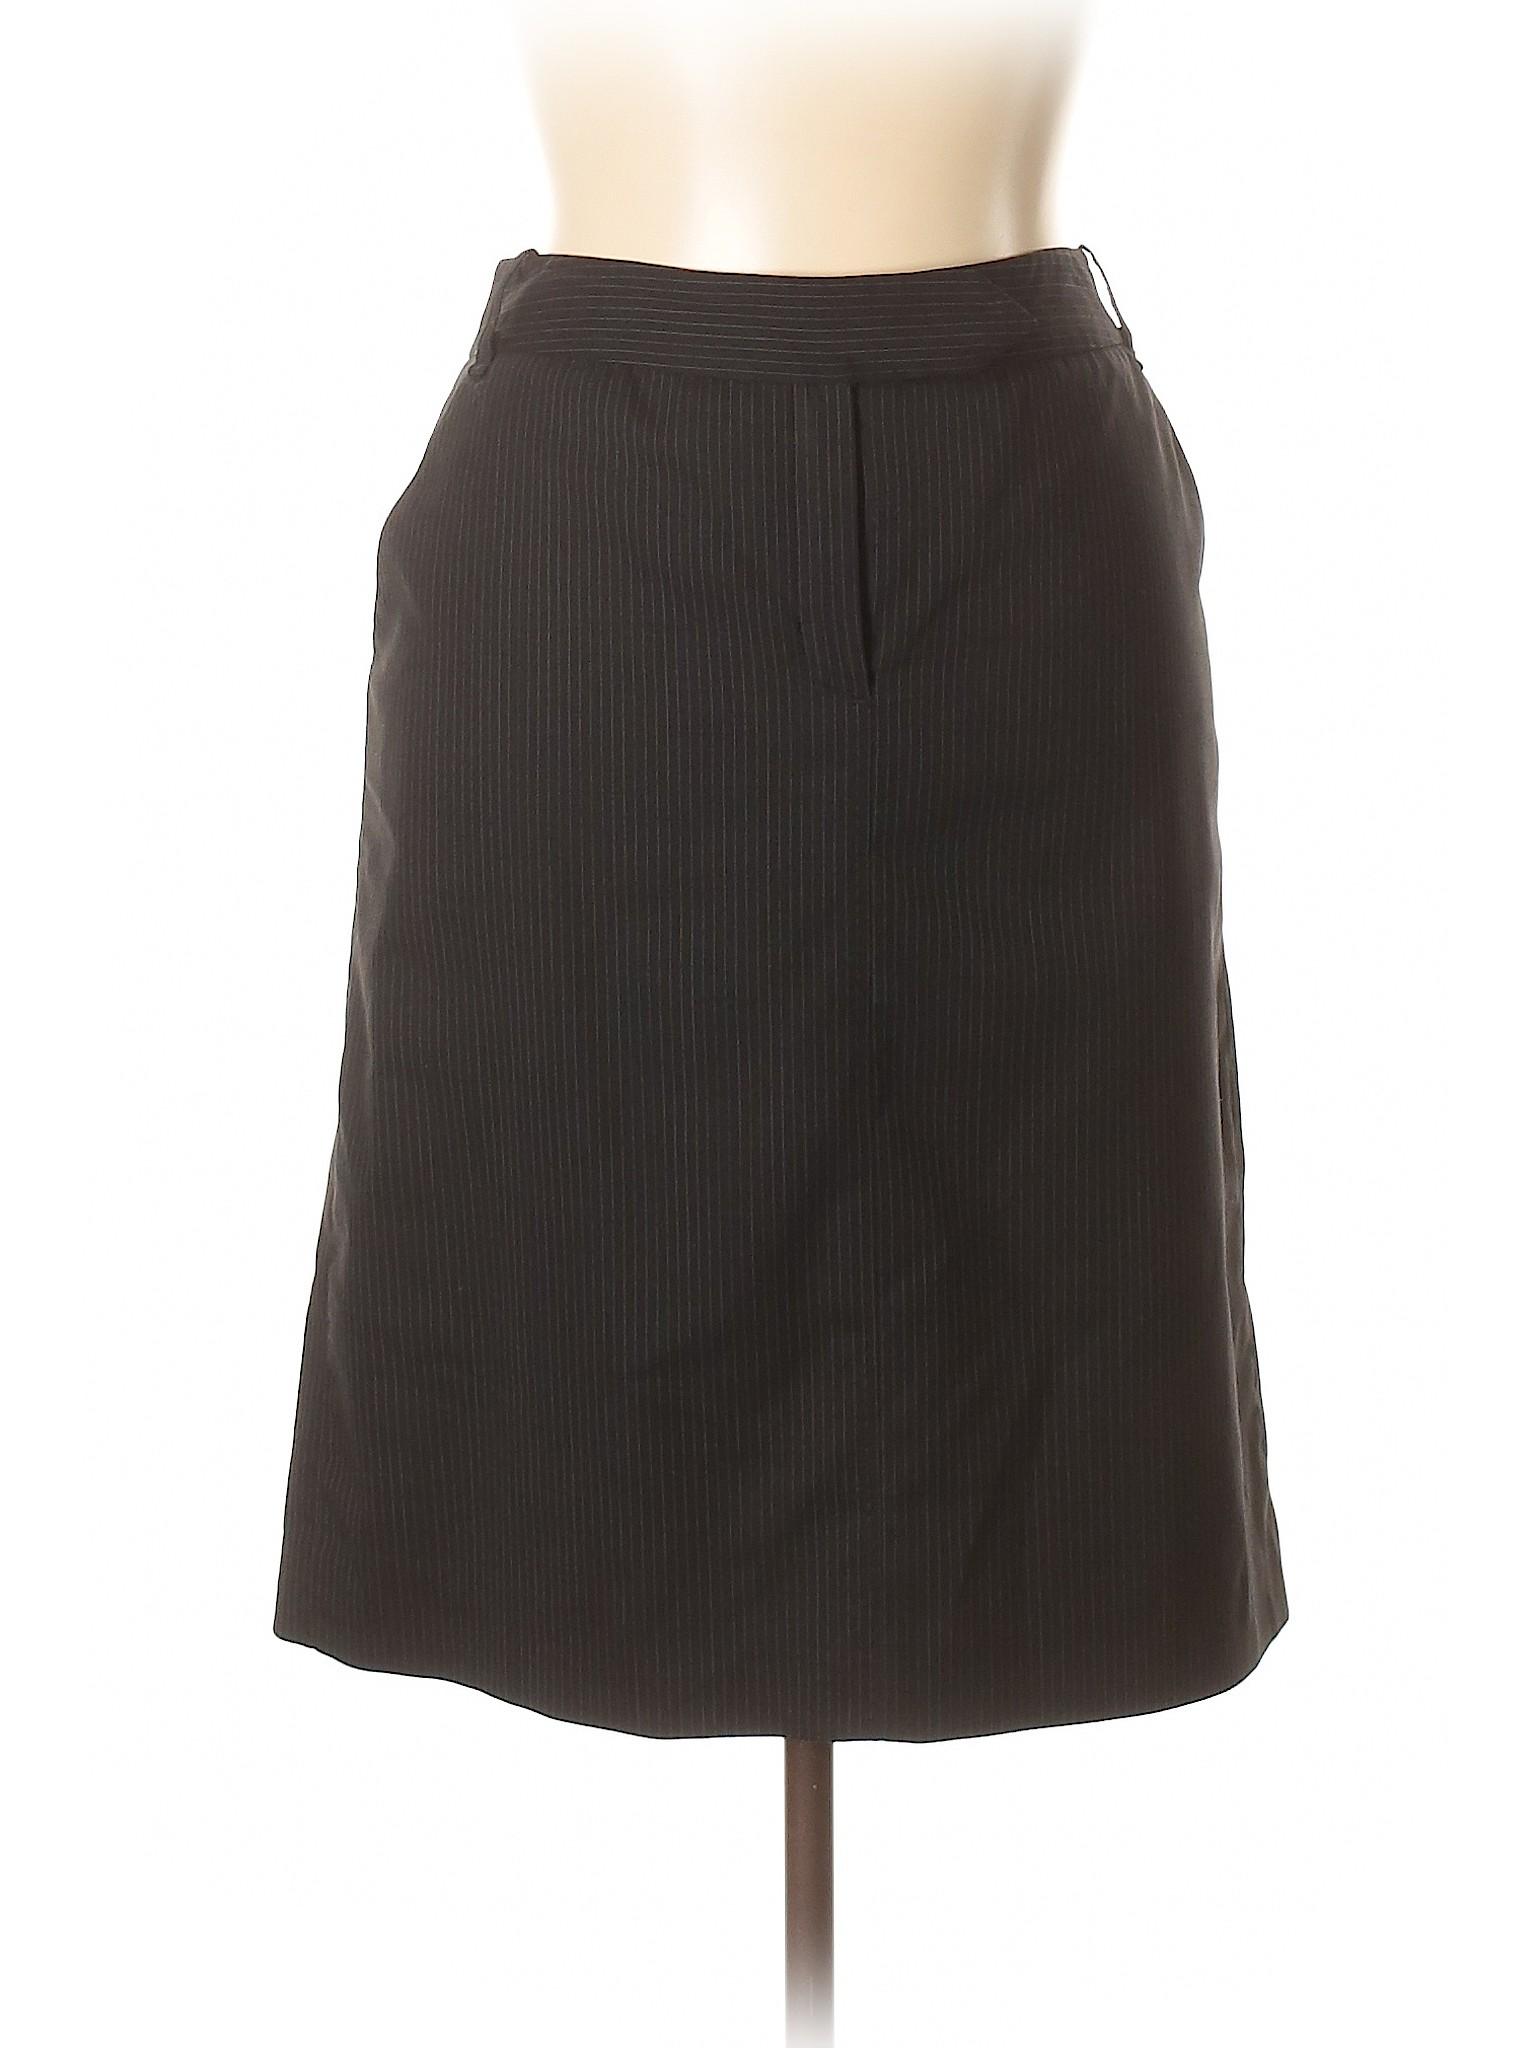 Wool leisure Studio Skirt Max Boutique dtqHwBB